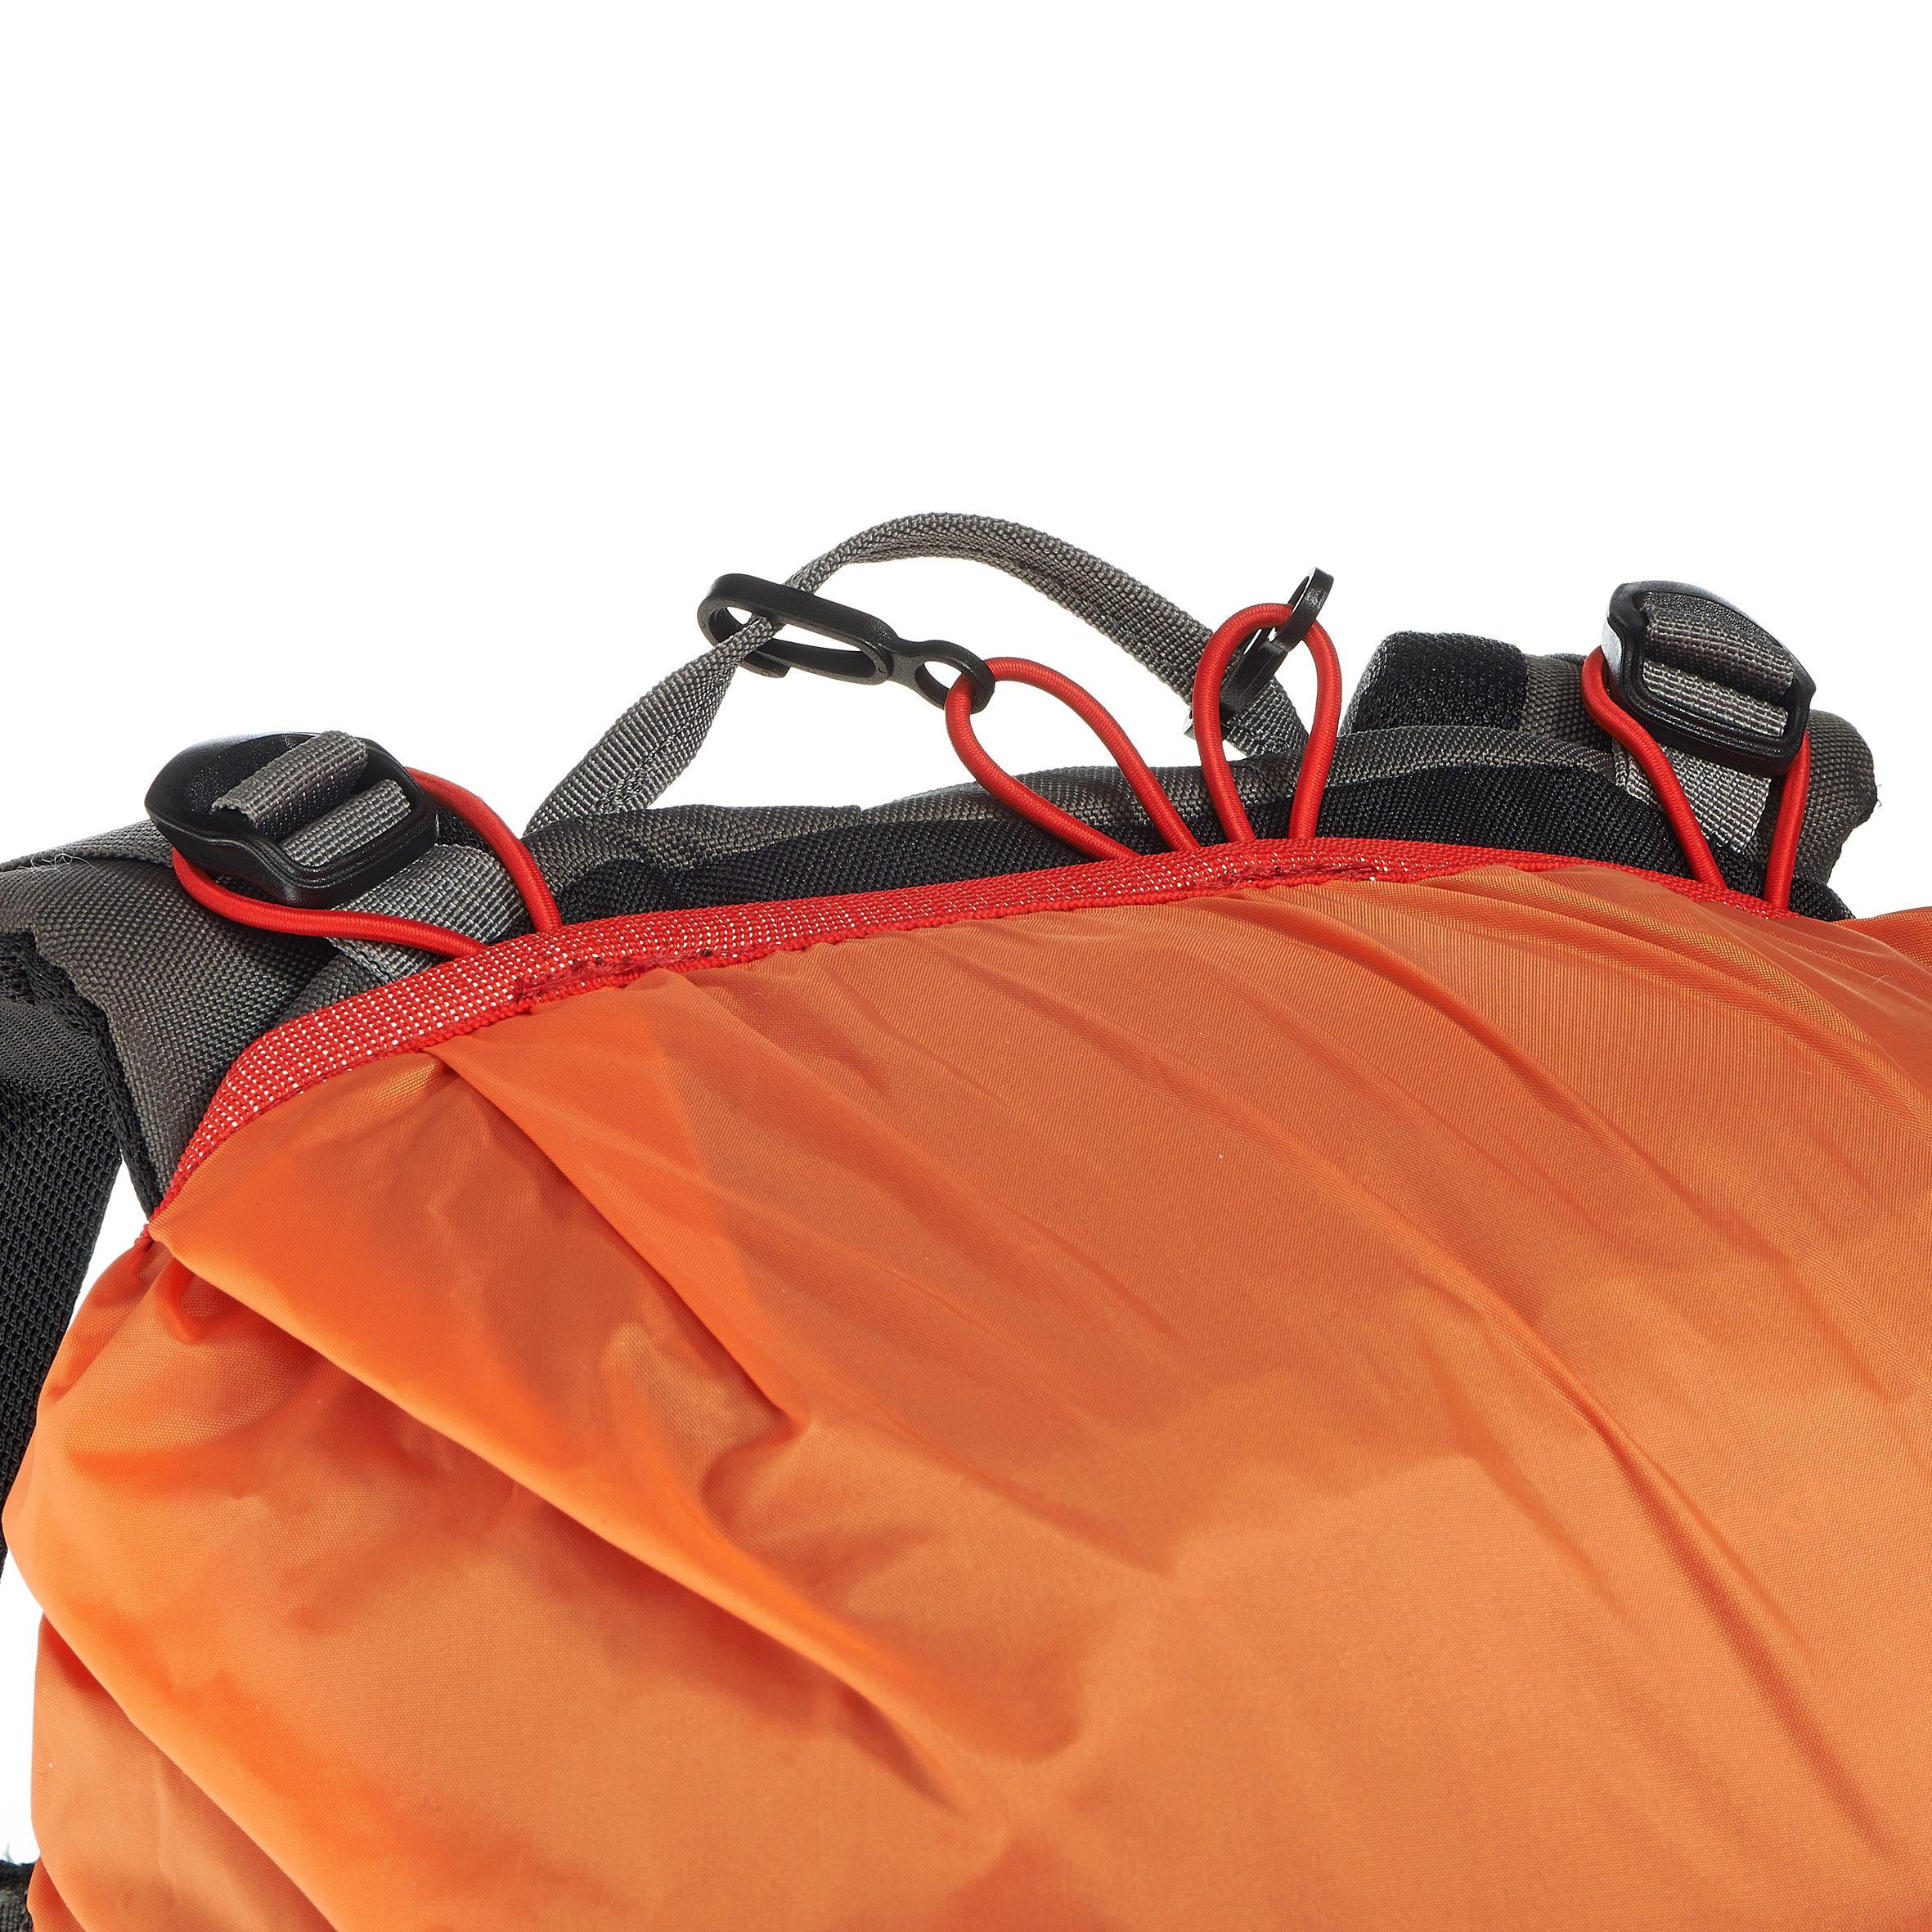 Rain Cover for 20 to 35 Litre Backpacks